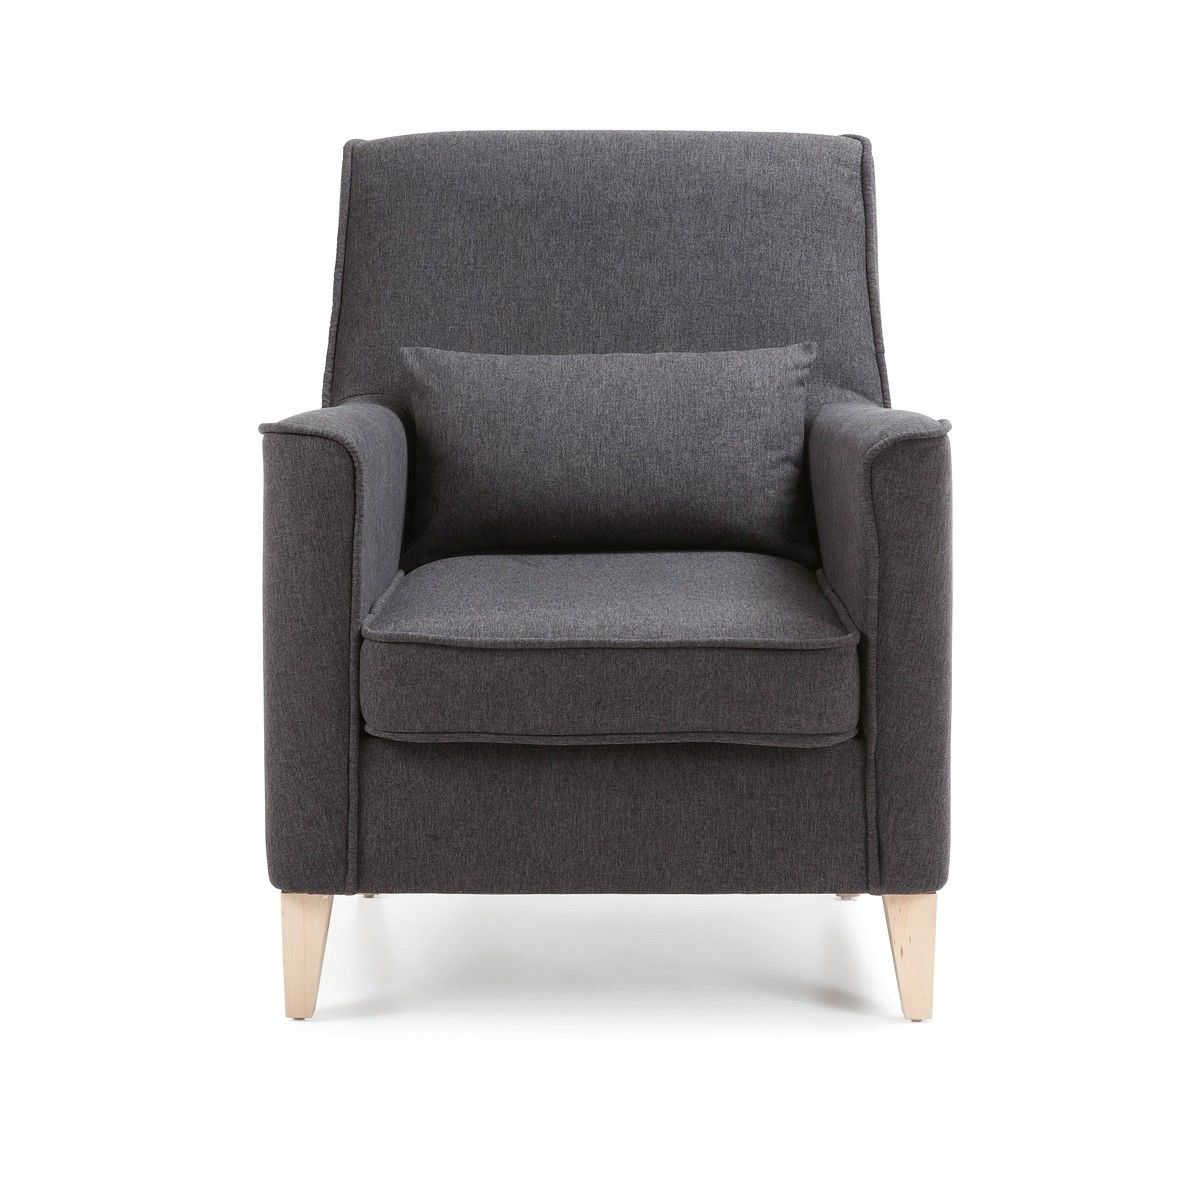 Amicis Fabric Lounge Armchair, Graphite